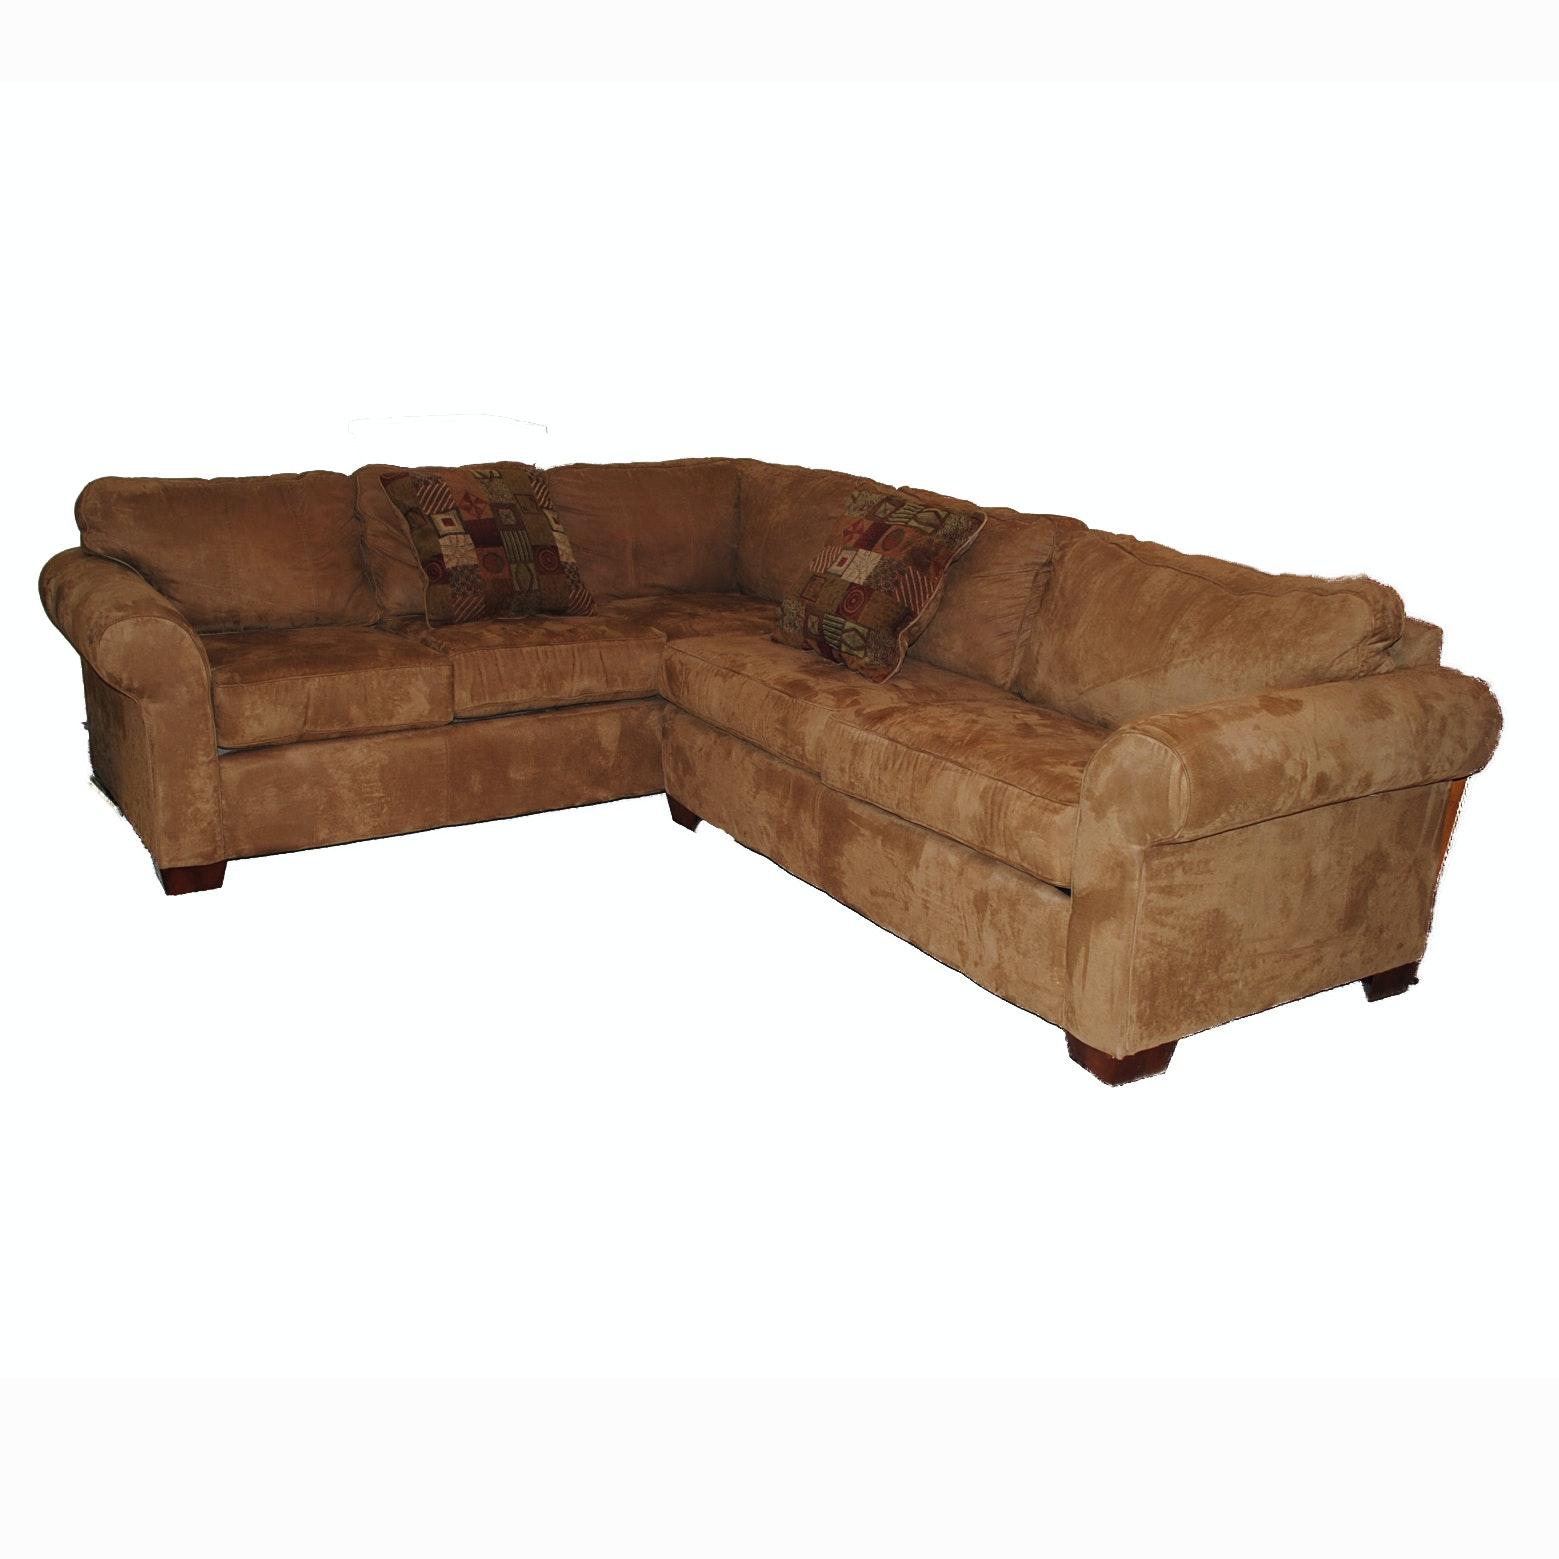 L-Shaped Sectional Sleeper Sofa